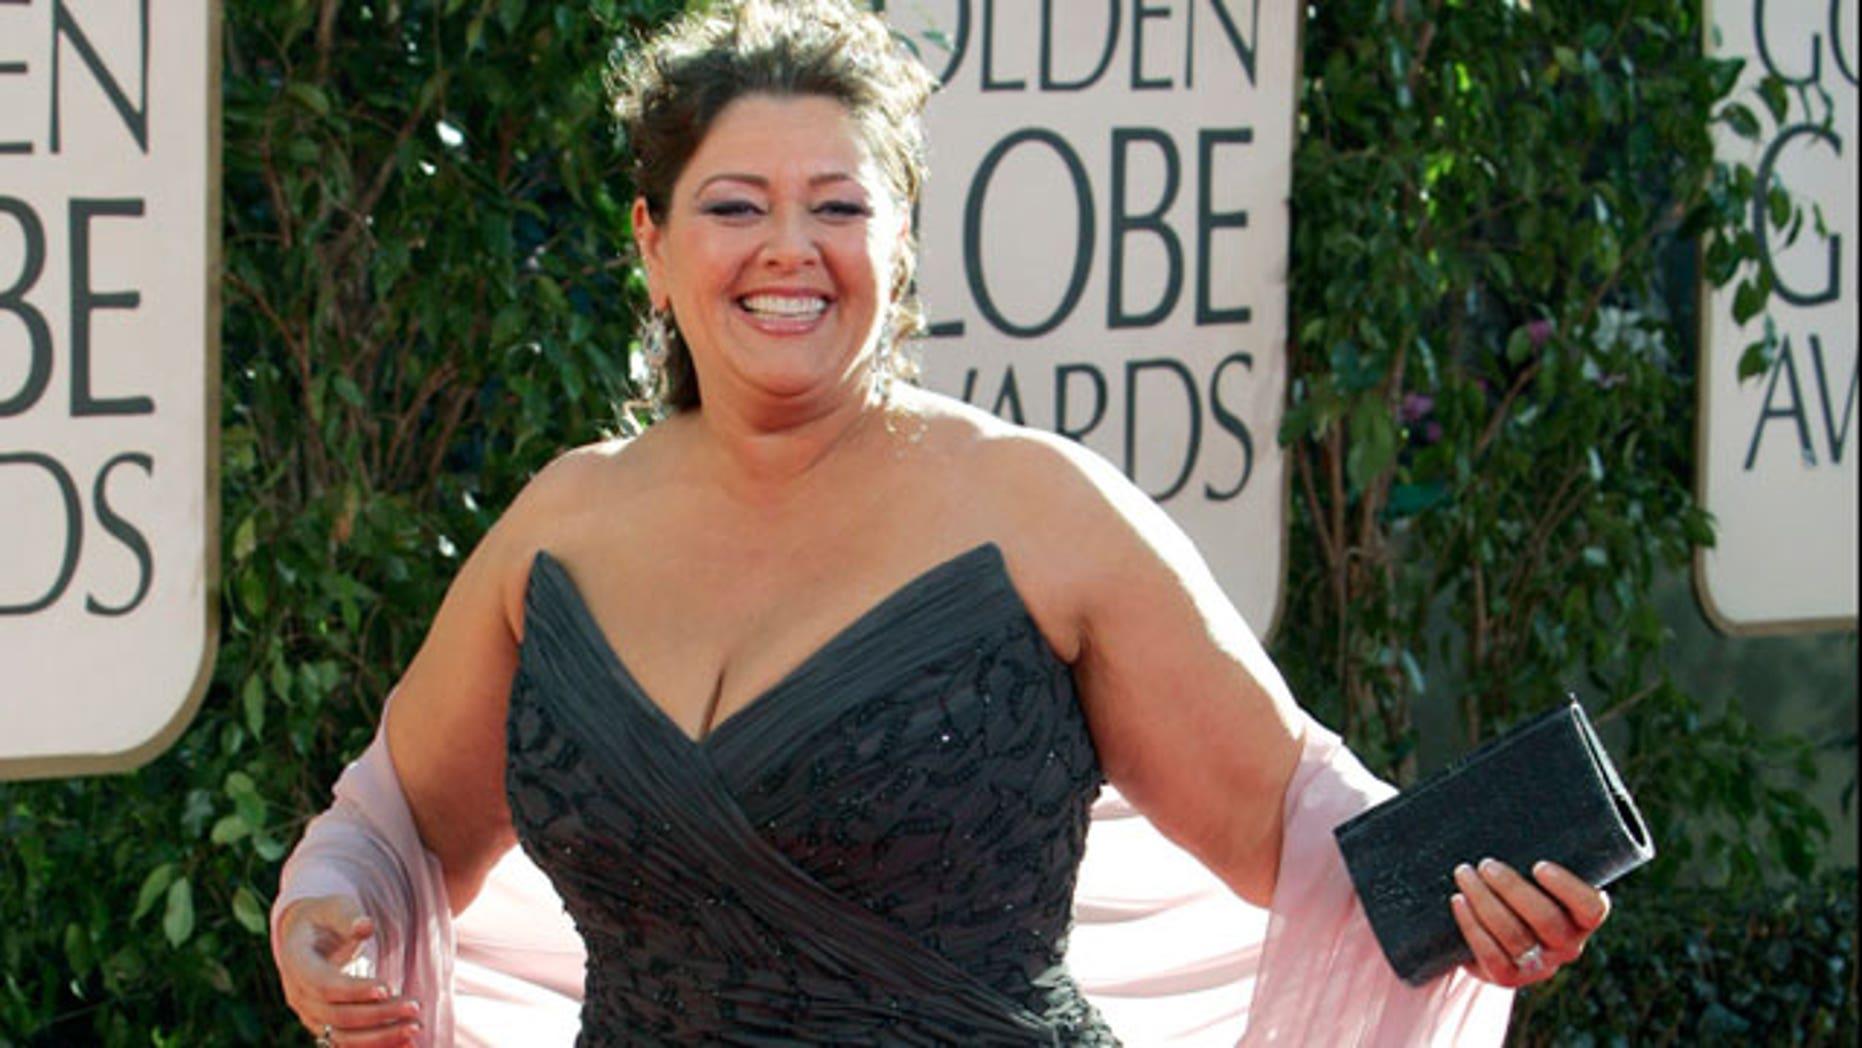 Camryn Manheim at the 2006 Golden Globe Awards